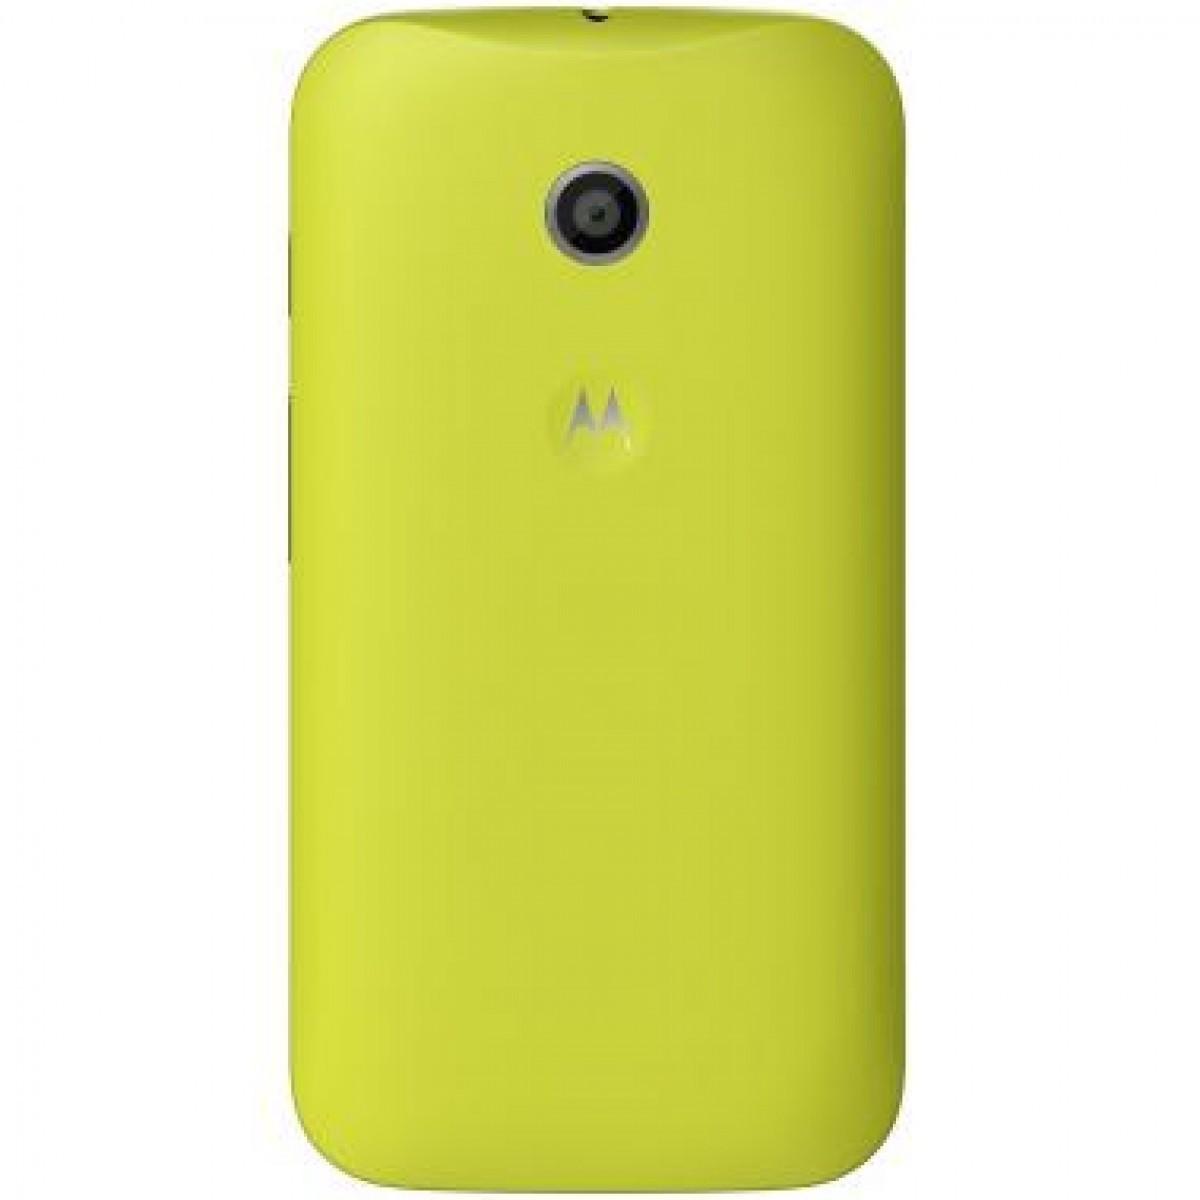 Motorola Shell für Motorola Moto E gelb